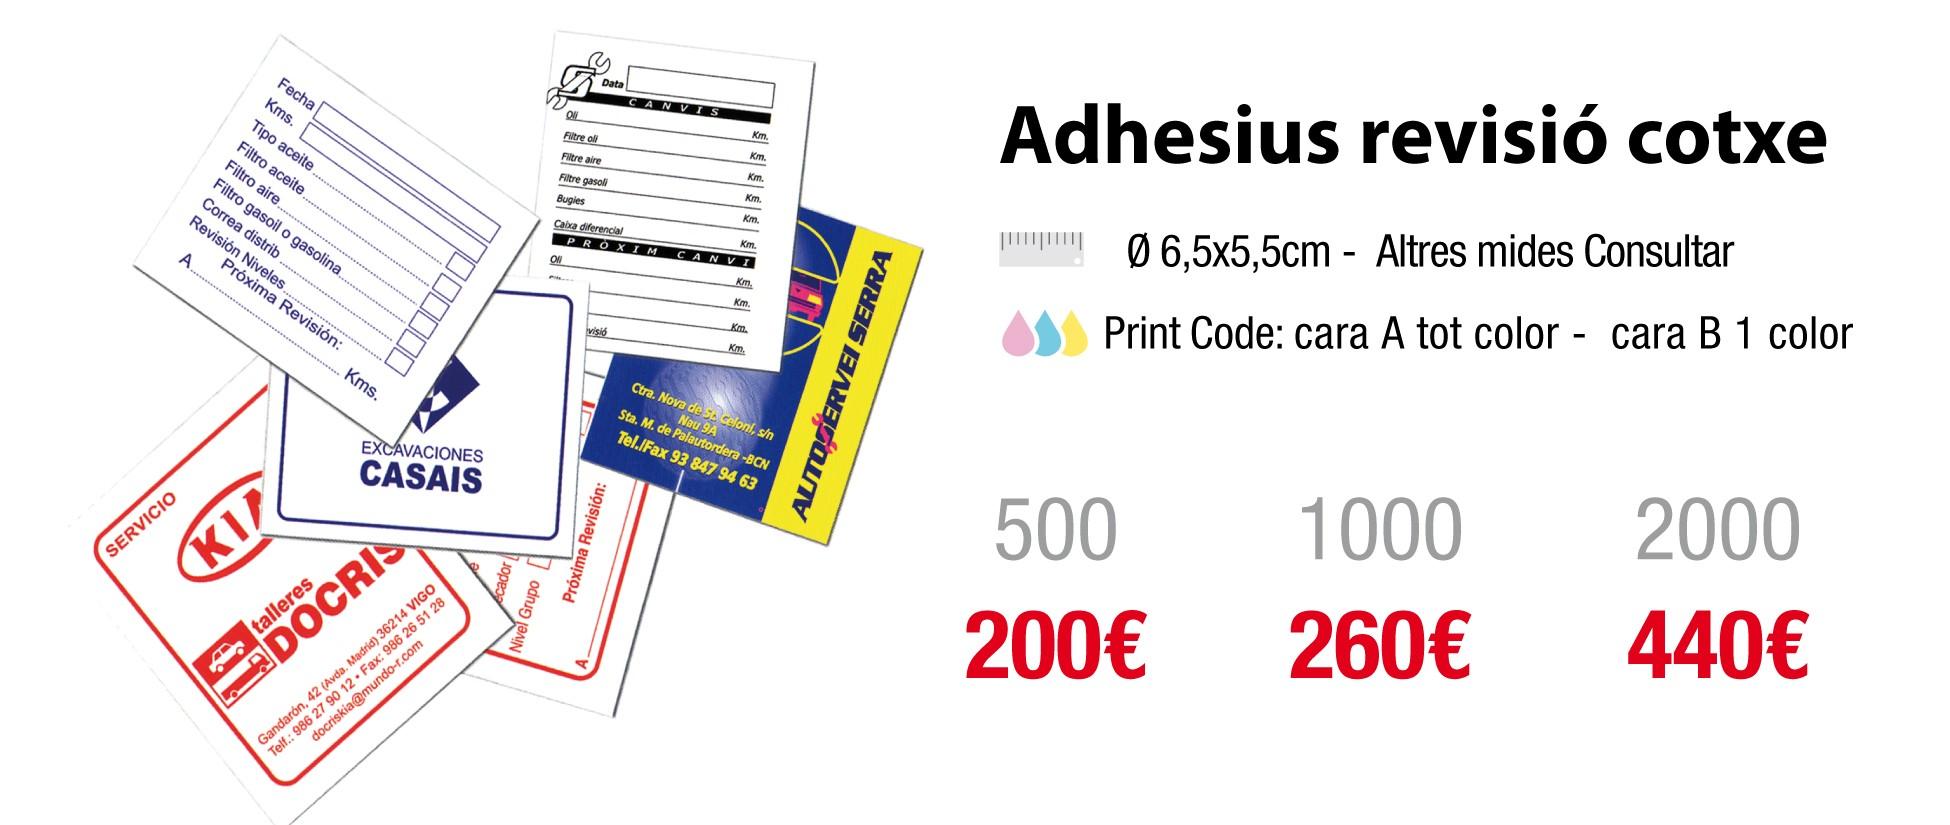 adhesius revisió vehicle